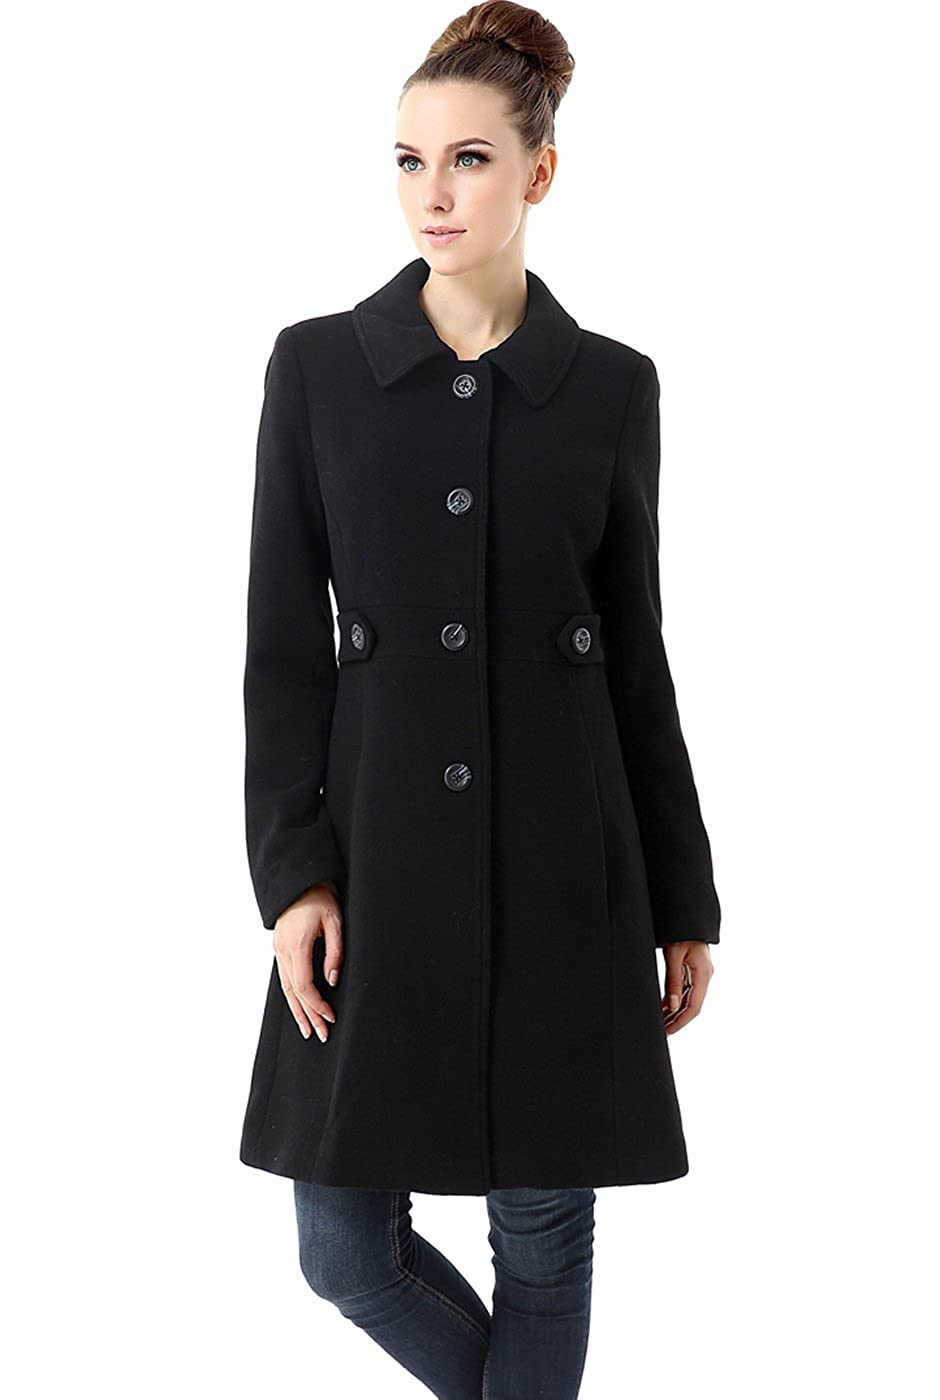 592d991ae BGSD Women's Heather Wool Blend Walking Coat (Regular Plus & Short)